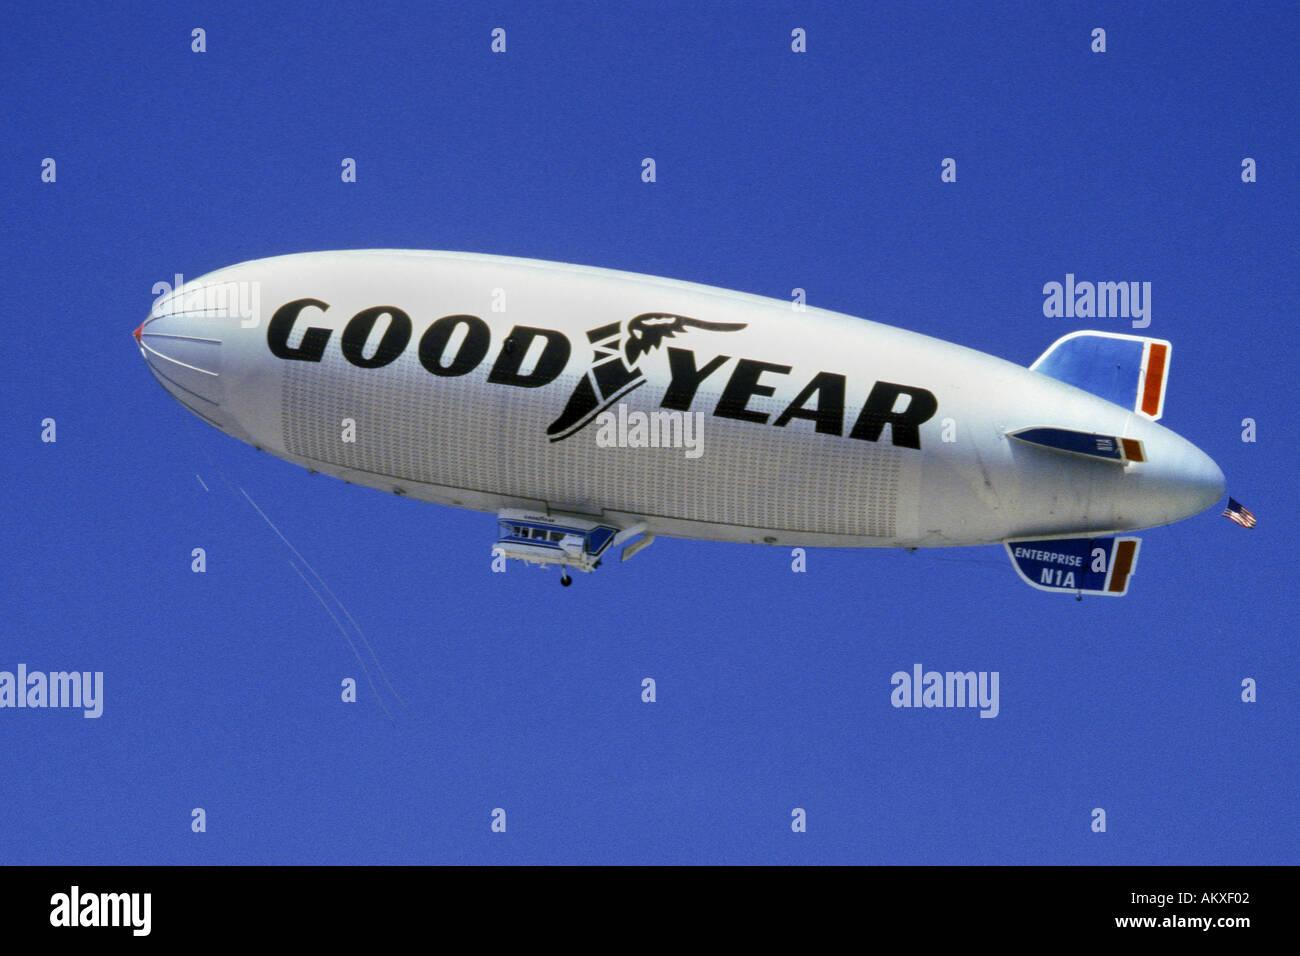 Goodyear Blimp - Stock Image